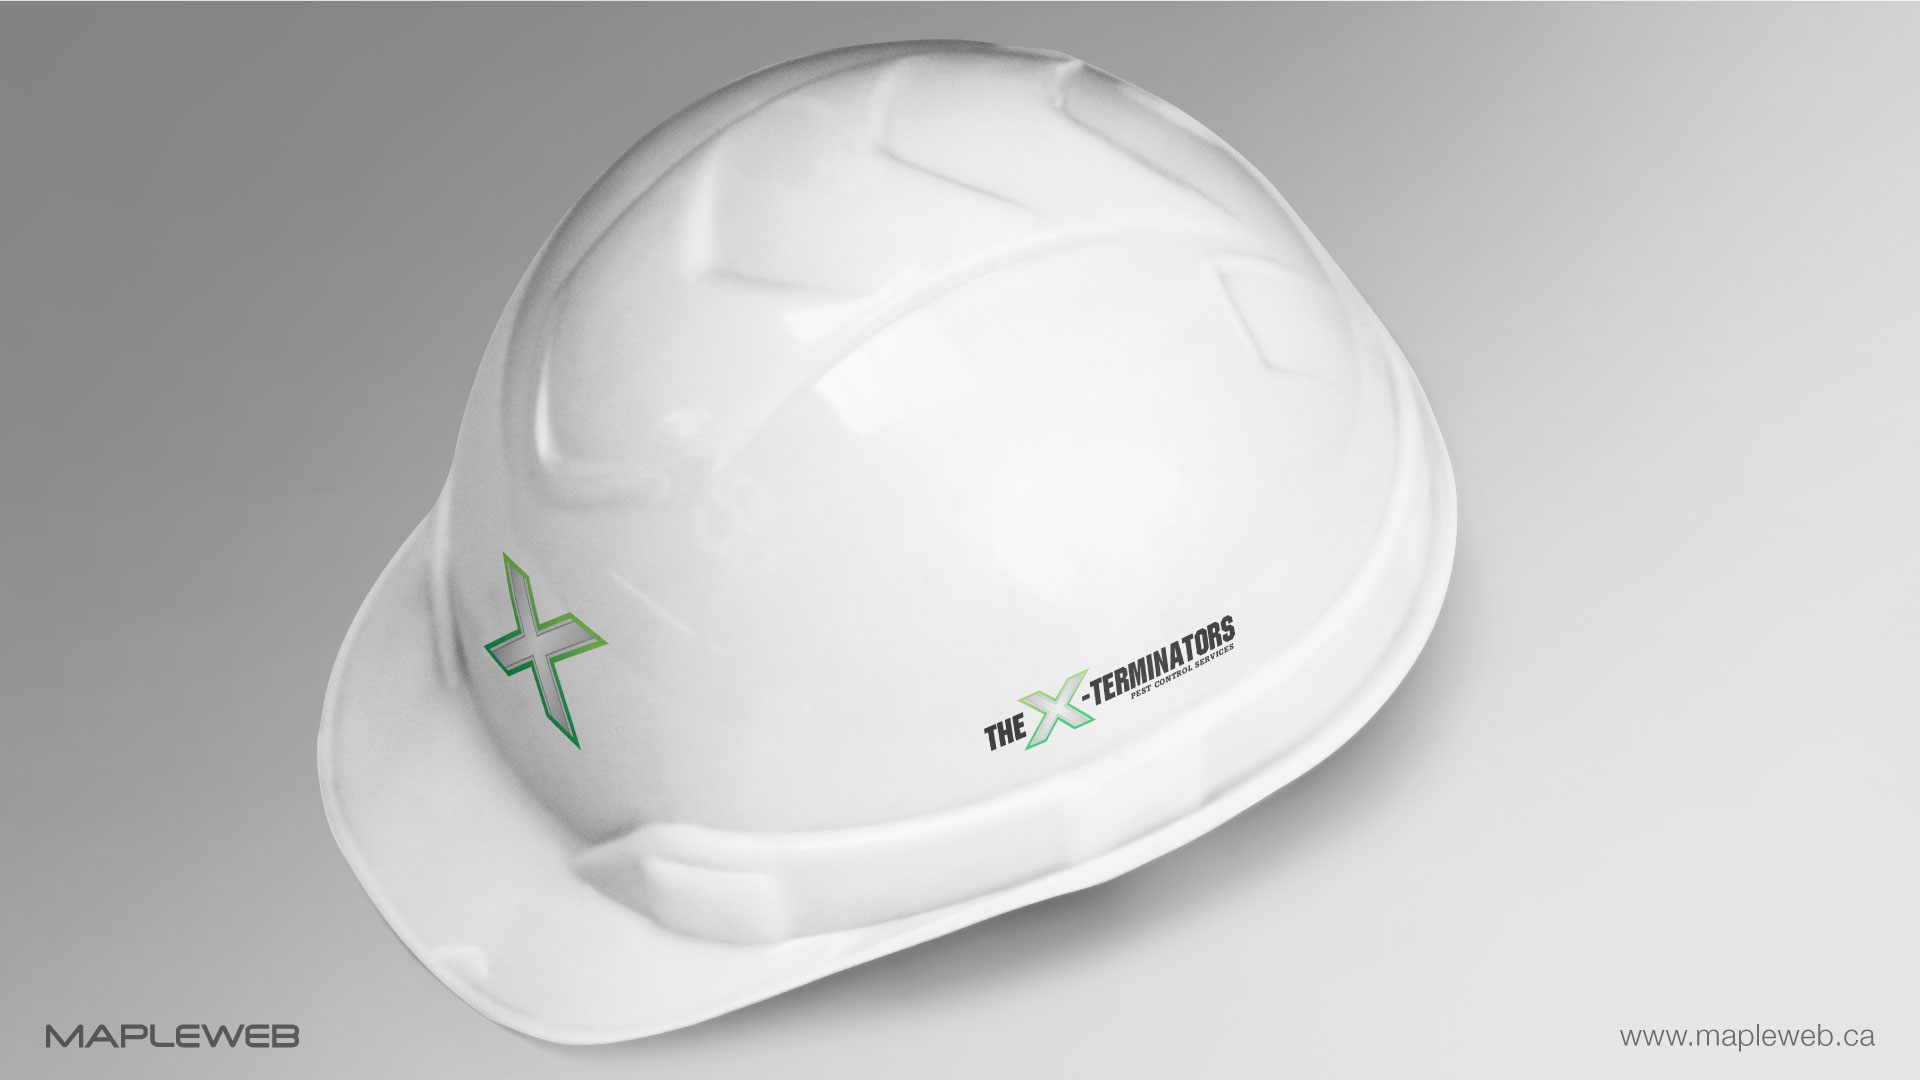 the-x-terminators-brand-logo-design-by-mapleweb-vancouver-canada-helmet-mock